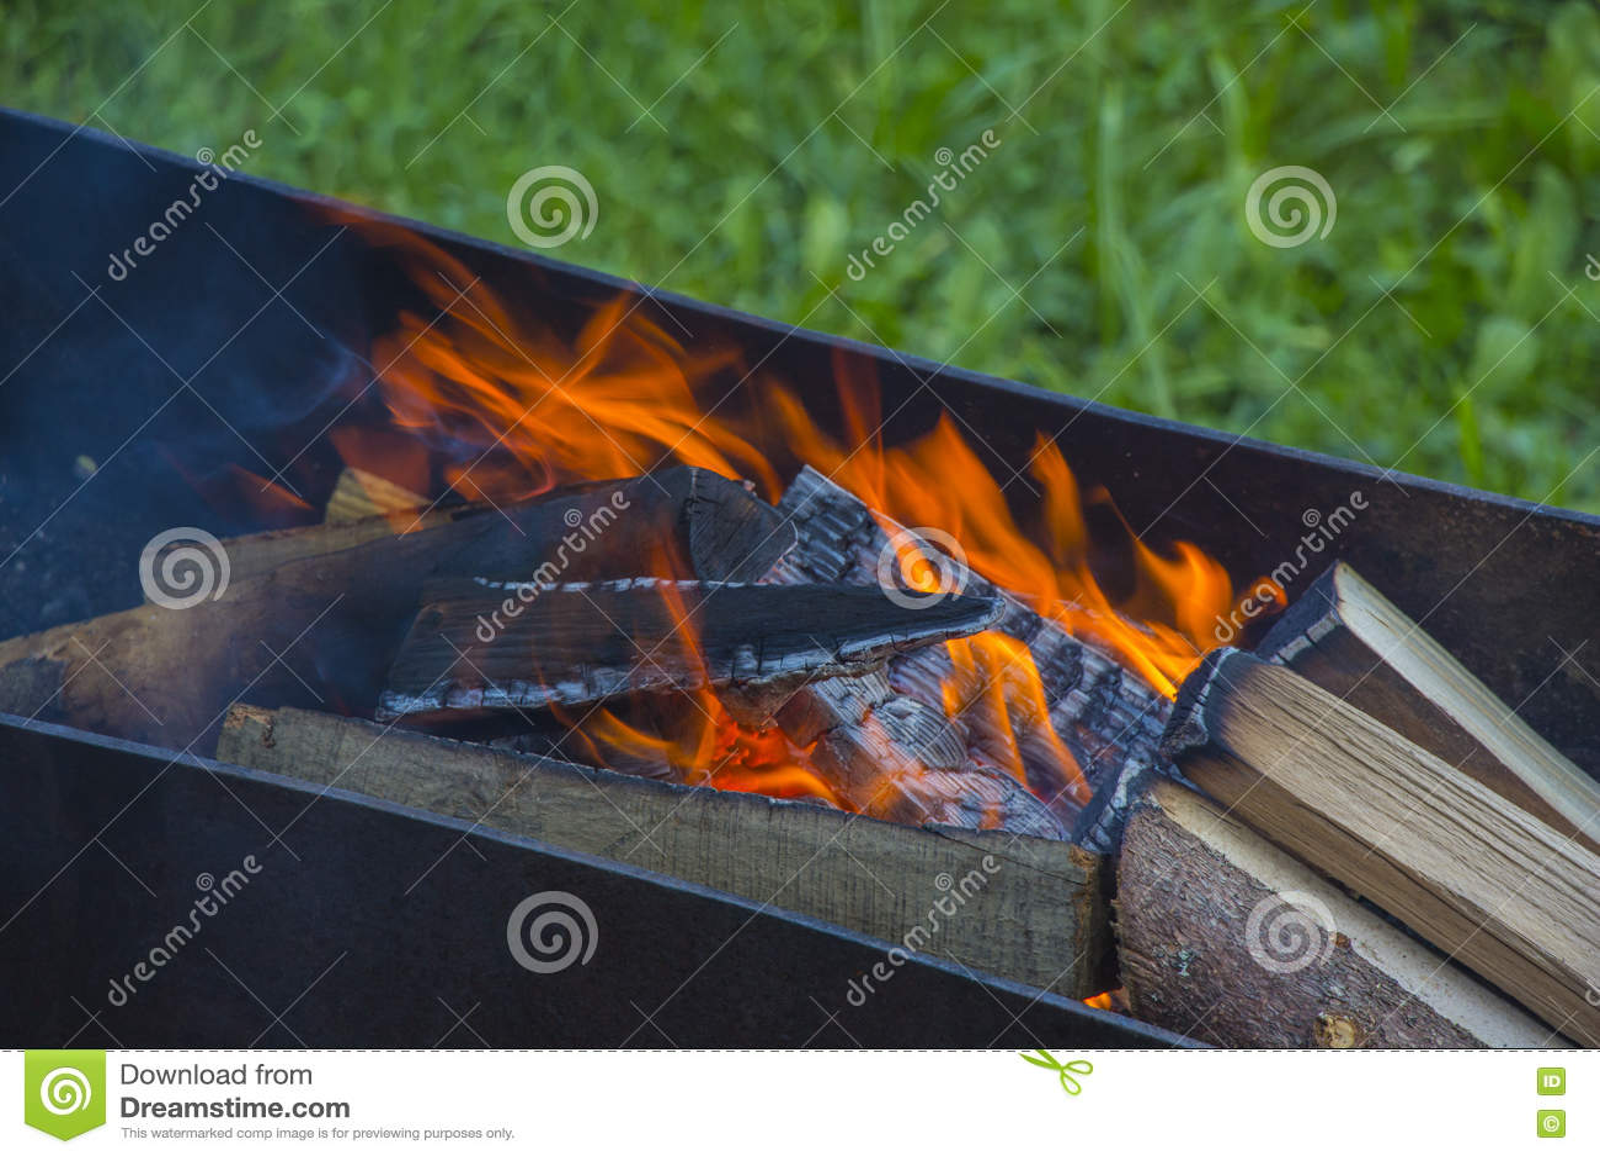 Brasero avec des charbons brûlants